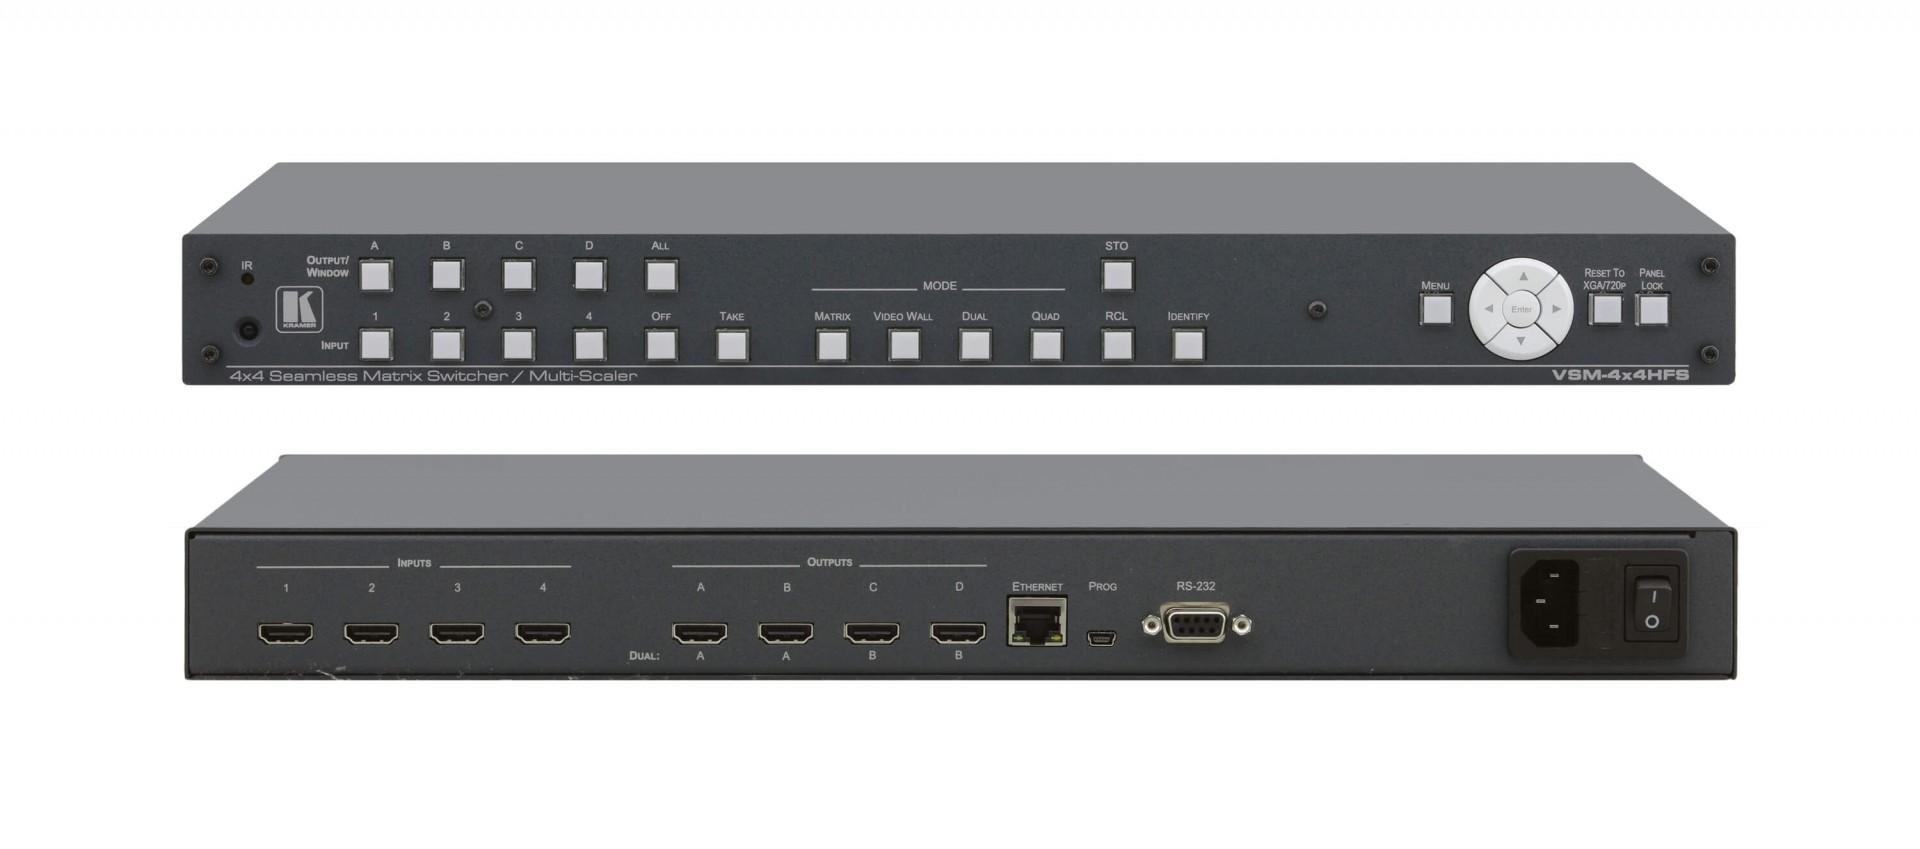 Kramer VSM-4x4HFS 4x4 Seamless Matrix Switcher/Multi–Scaler — Seamless matrix, video wall, dual display (PIP/P&P) and quad display